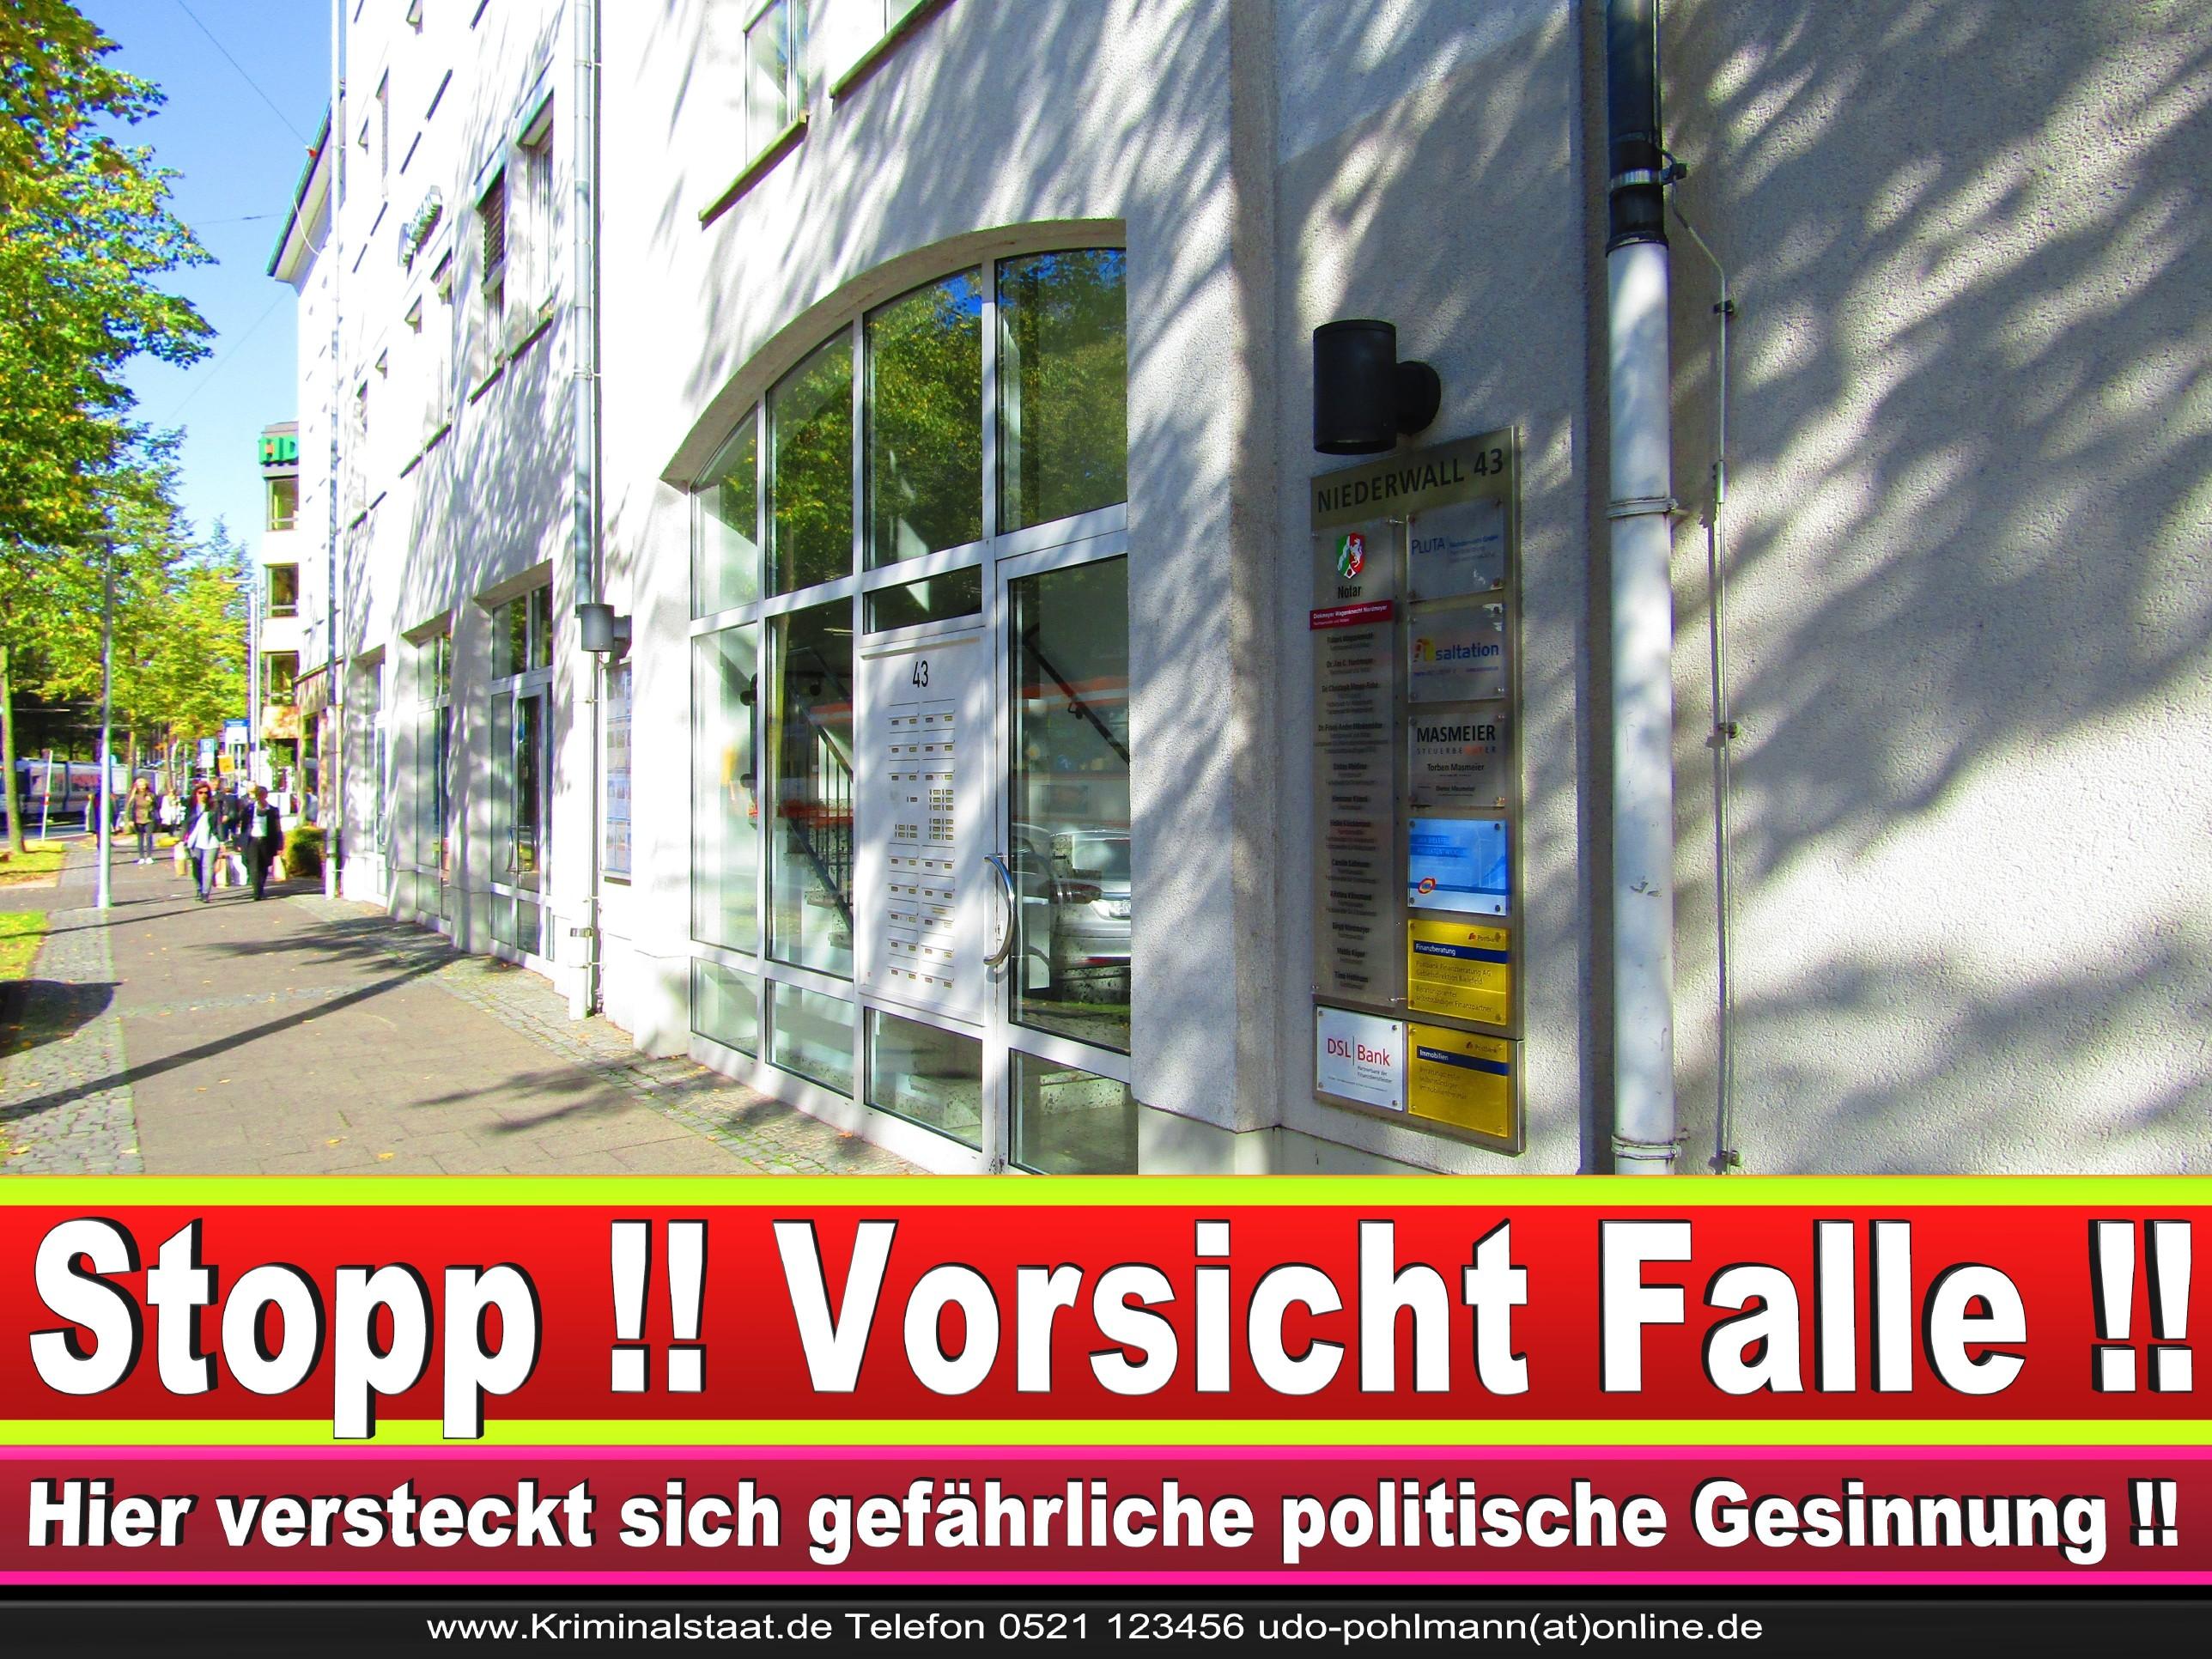 Rechtsanwältin Ricarda Osthus Niederwall 43 Bielefeld CDU 12